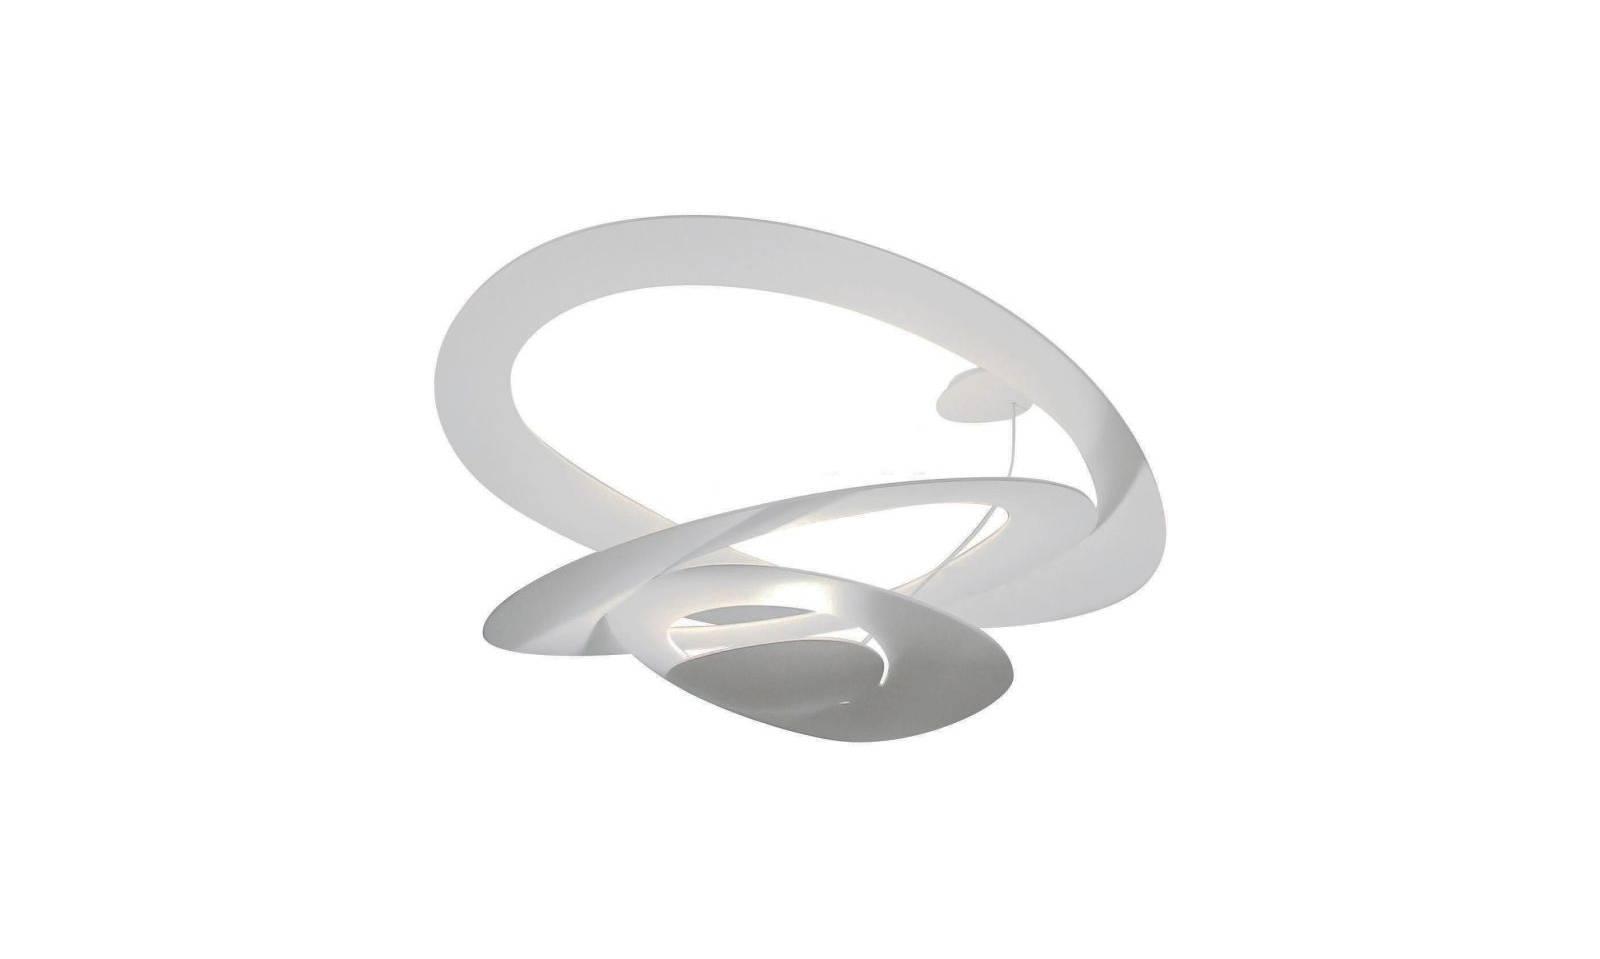 Lampade specchio bagno artemide: linea cromo applique led w lampada